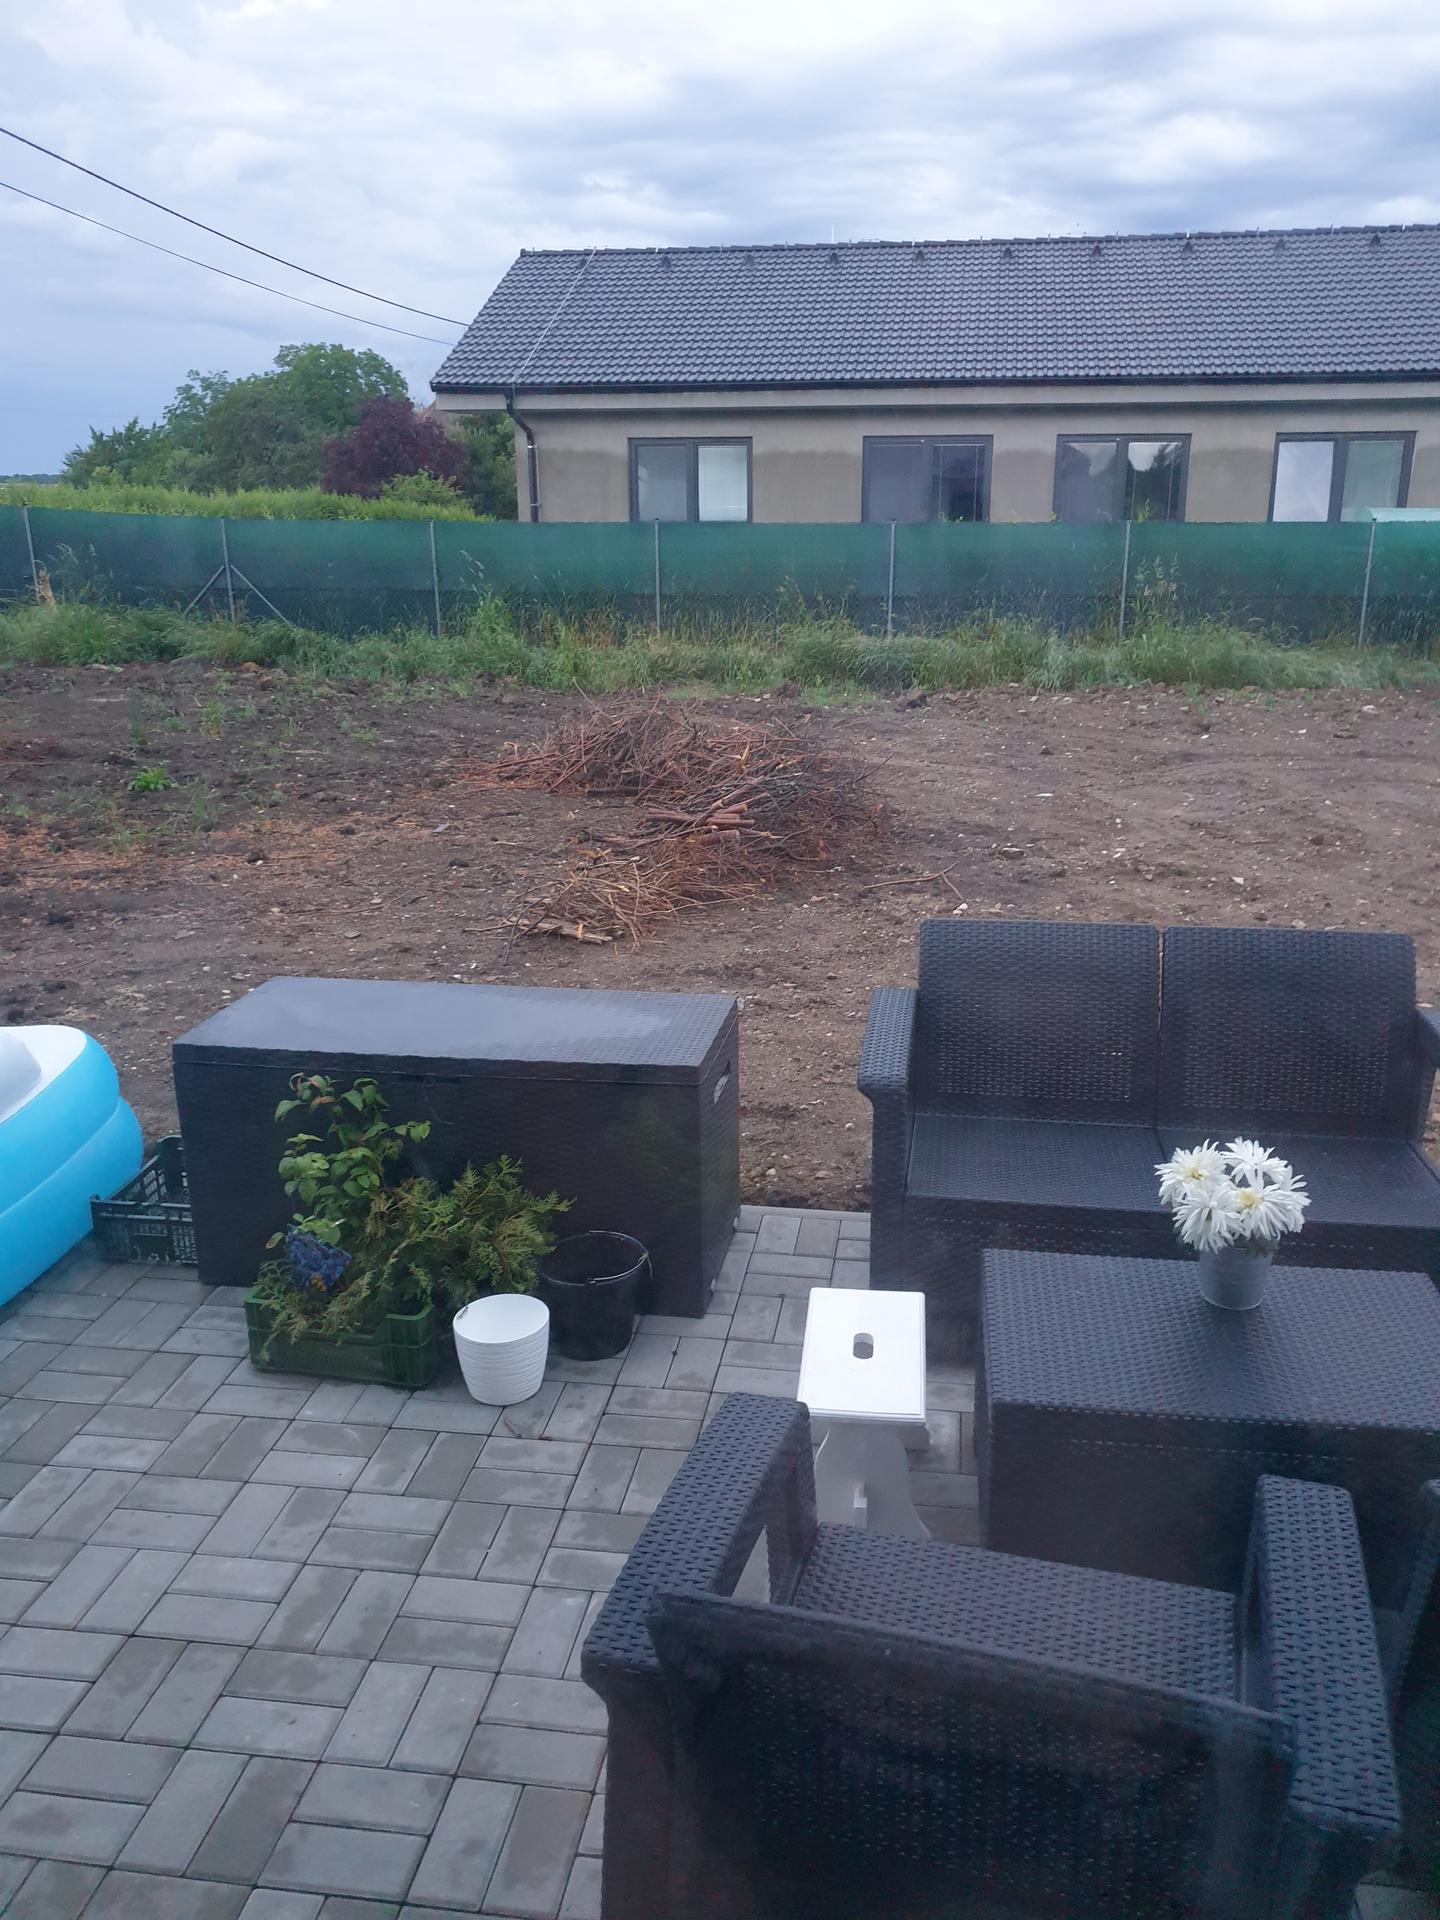 Zahrada a terasa - Obrázek č. 17